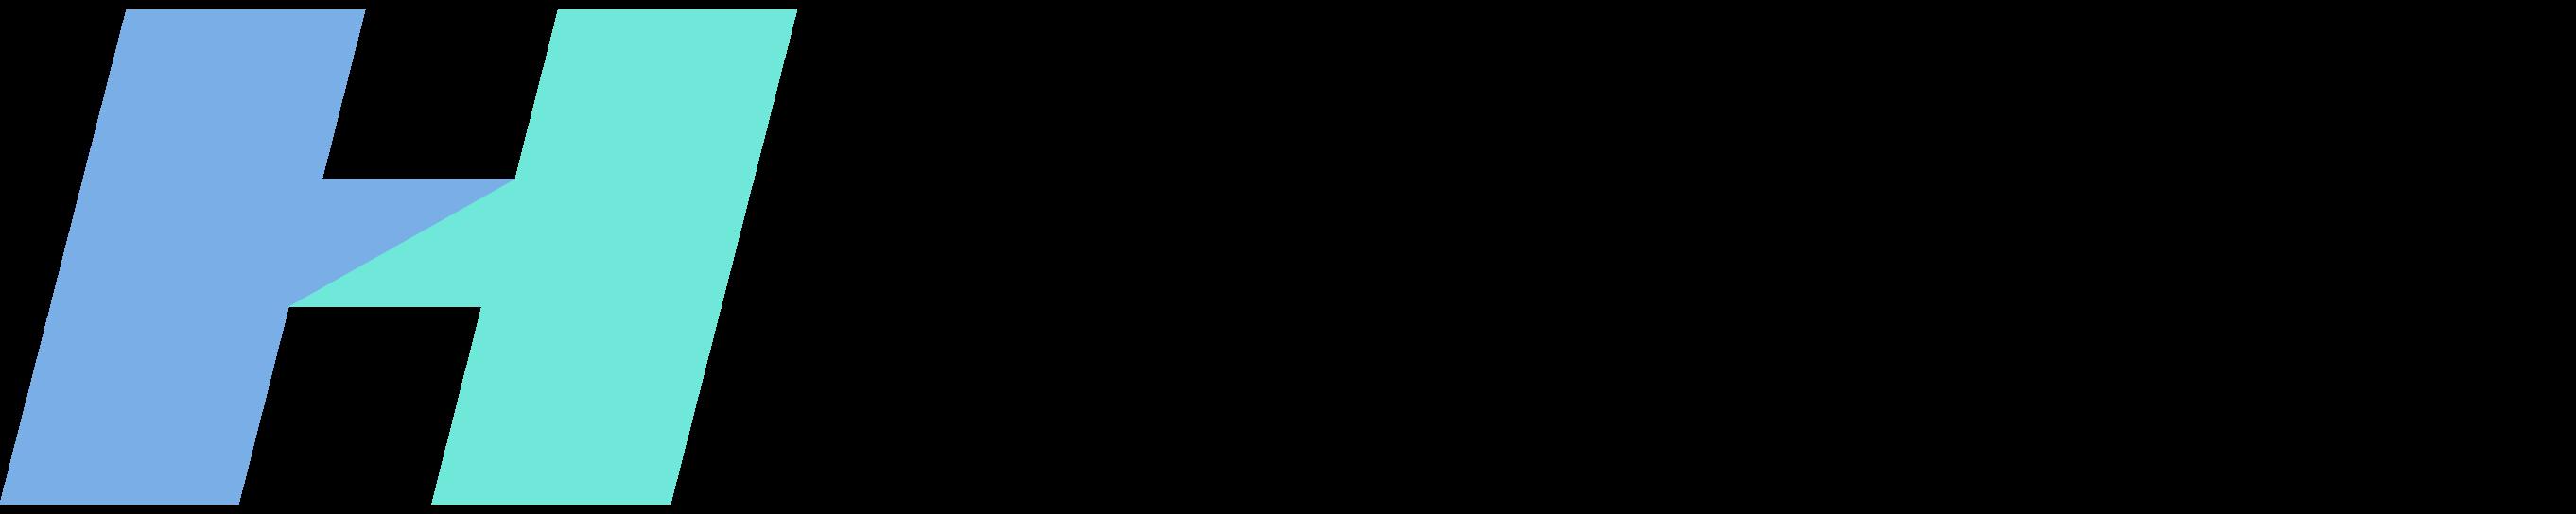 EUPHONY Inc.